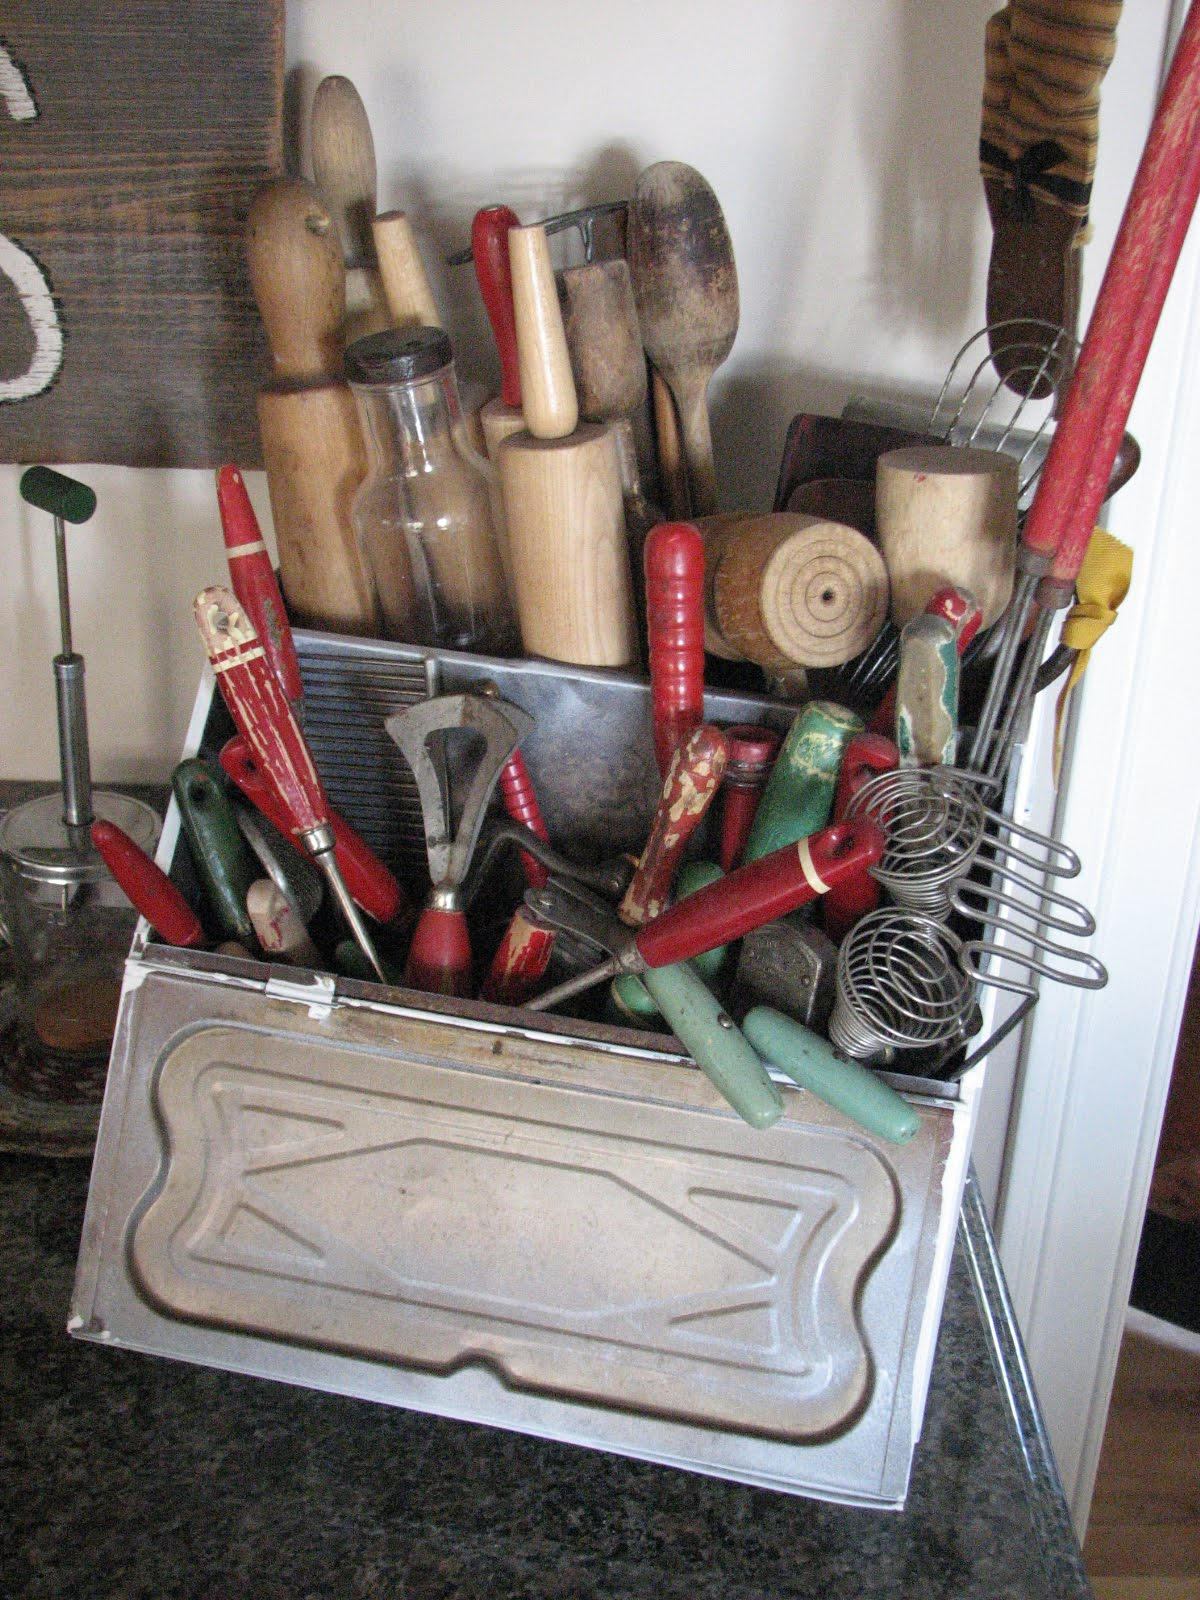 kitchen tool crock exhaust system treasured tidbits by tina 14 fun, simple ways to organize ...